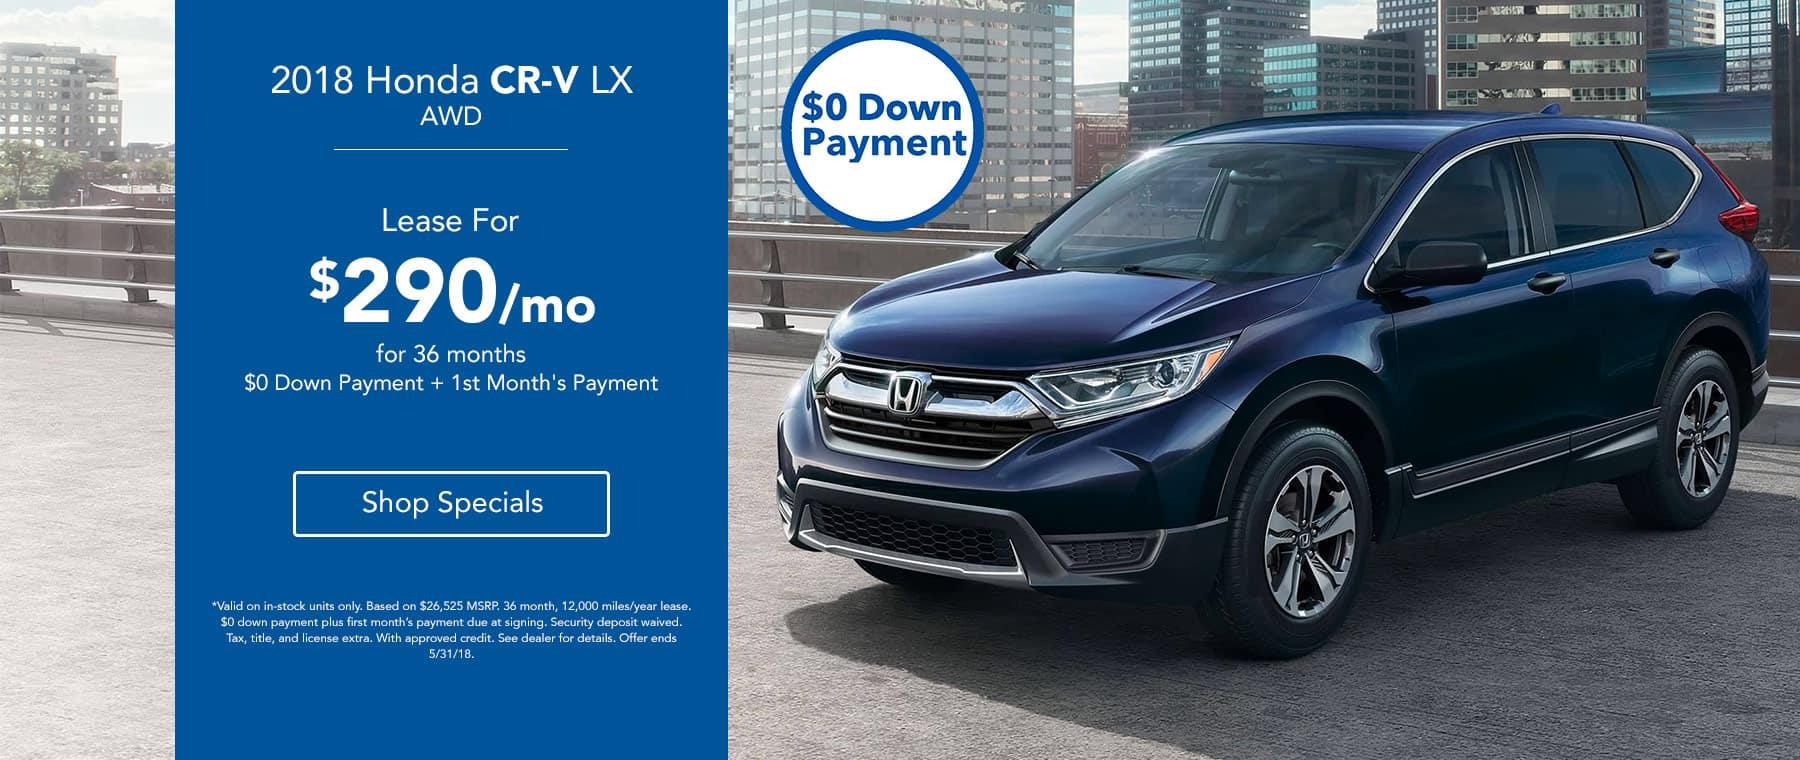 2018 Honda CR-V LX - Lease for $290/mo